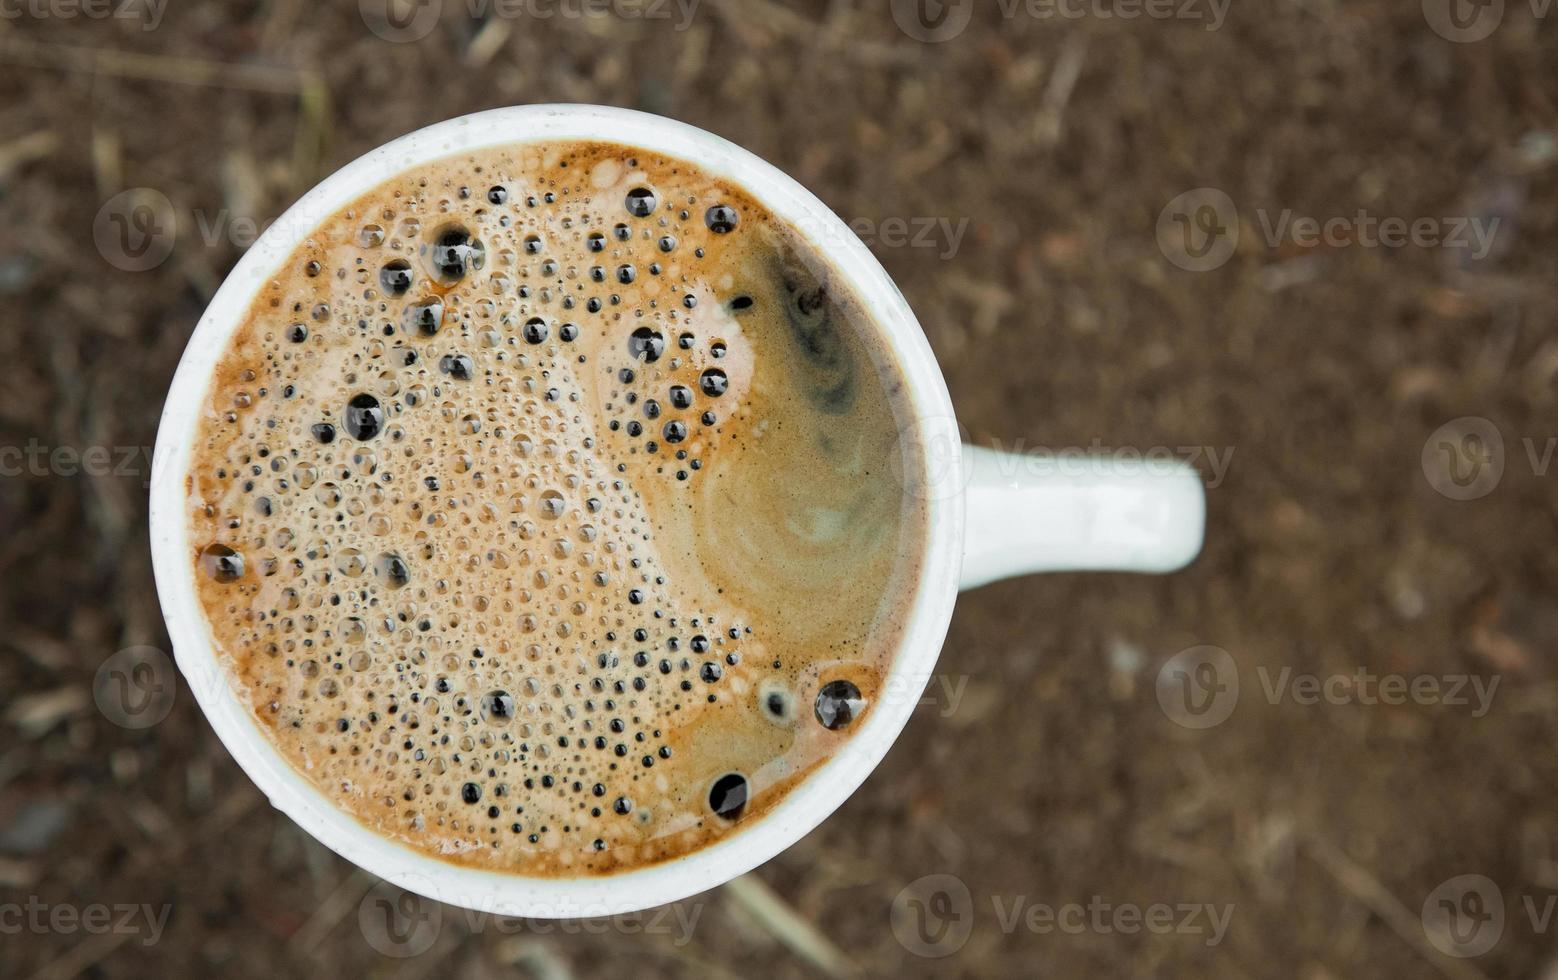 koffie close-up foto